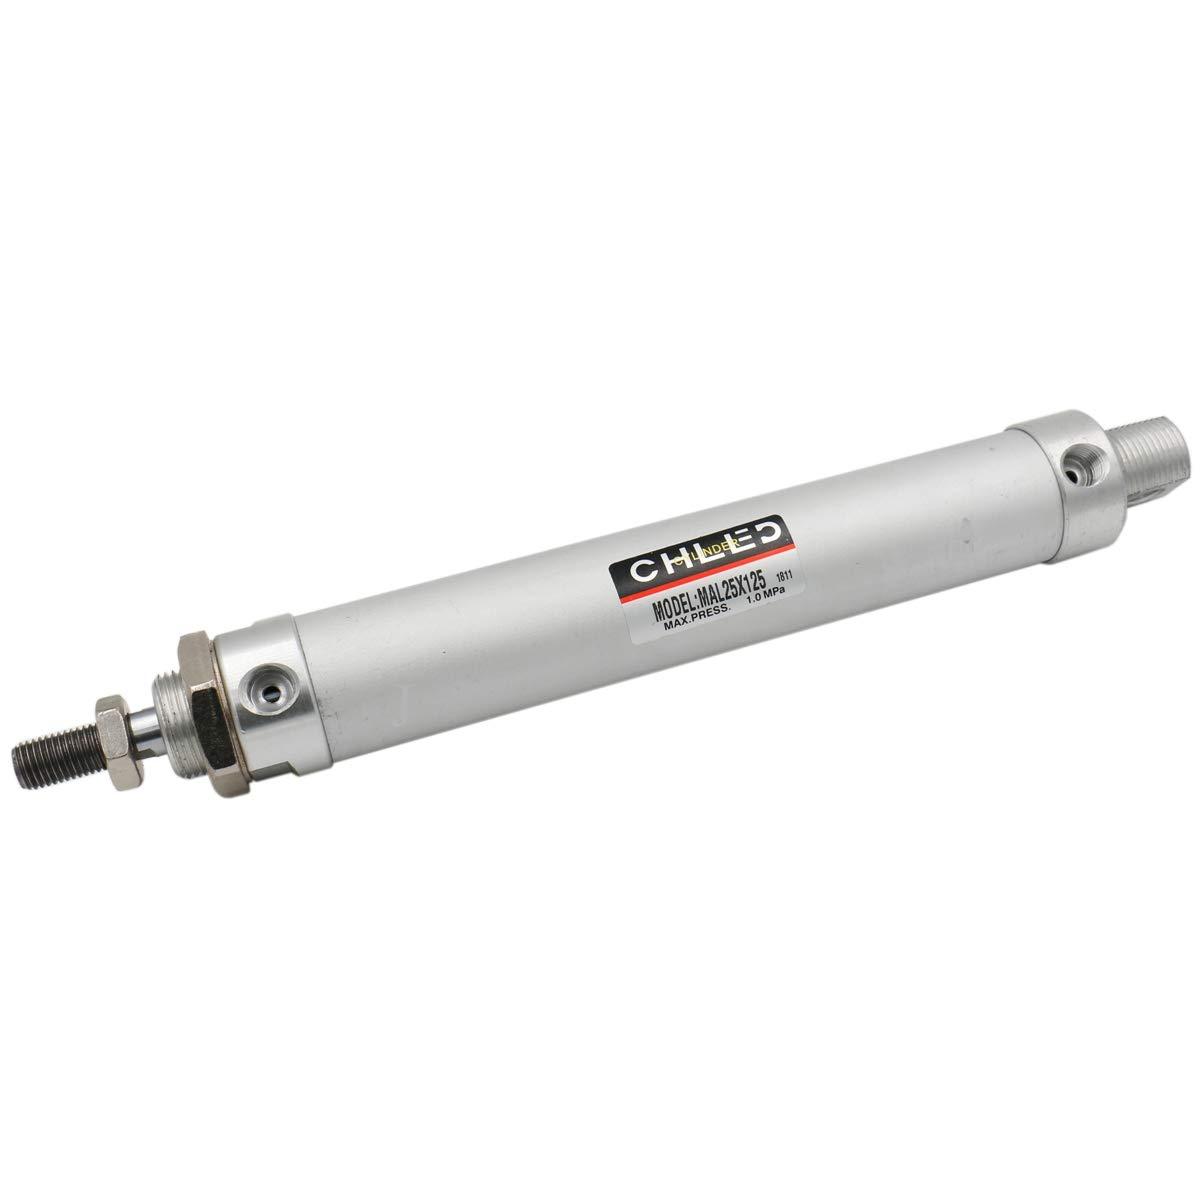 Baomain Mini Air Cylinder MAL 16 X 125 Single Male Thread Rod Dual Action 16 Bore 125 Stroke